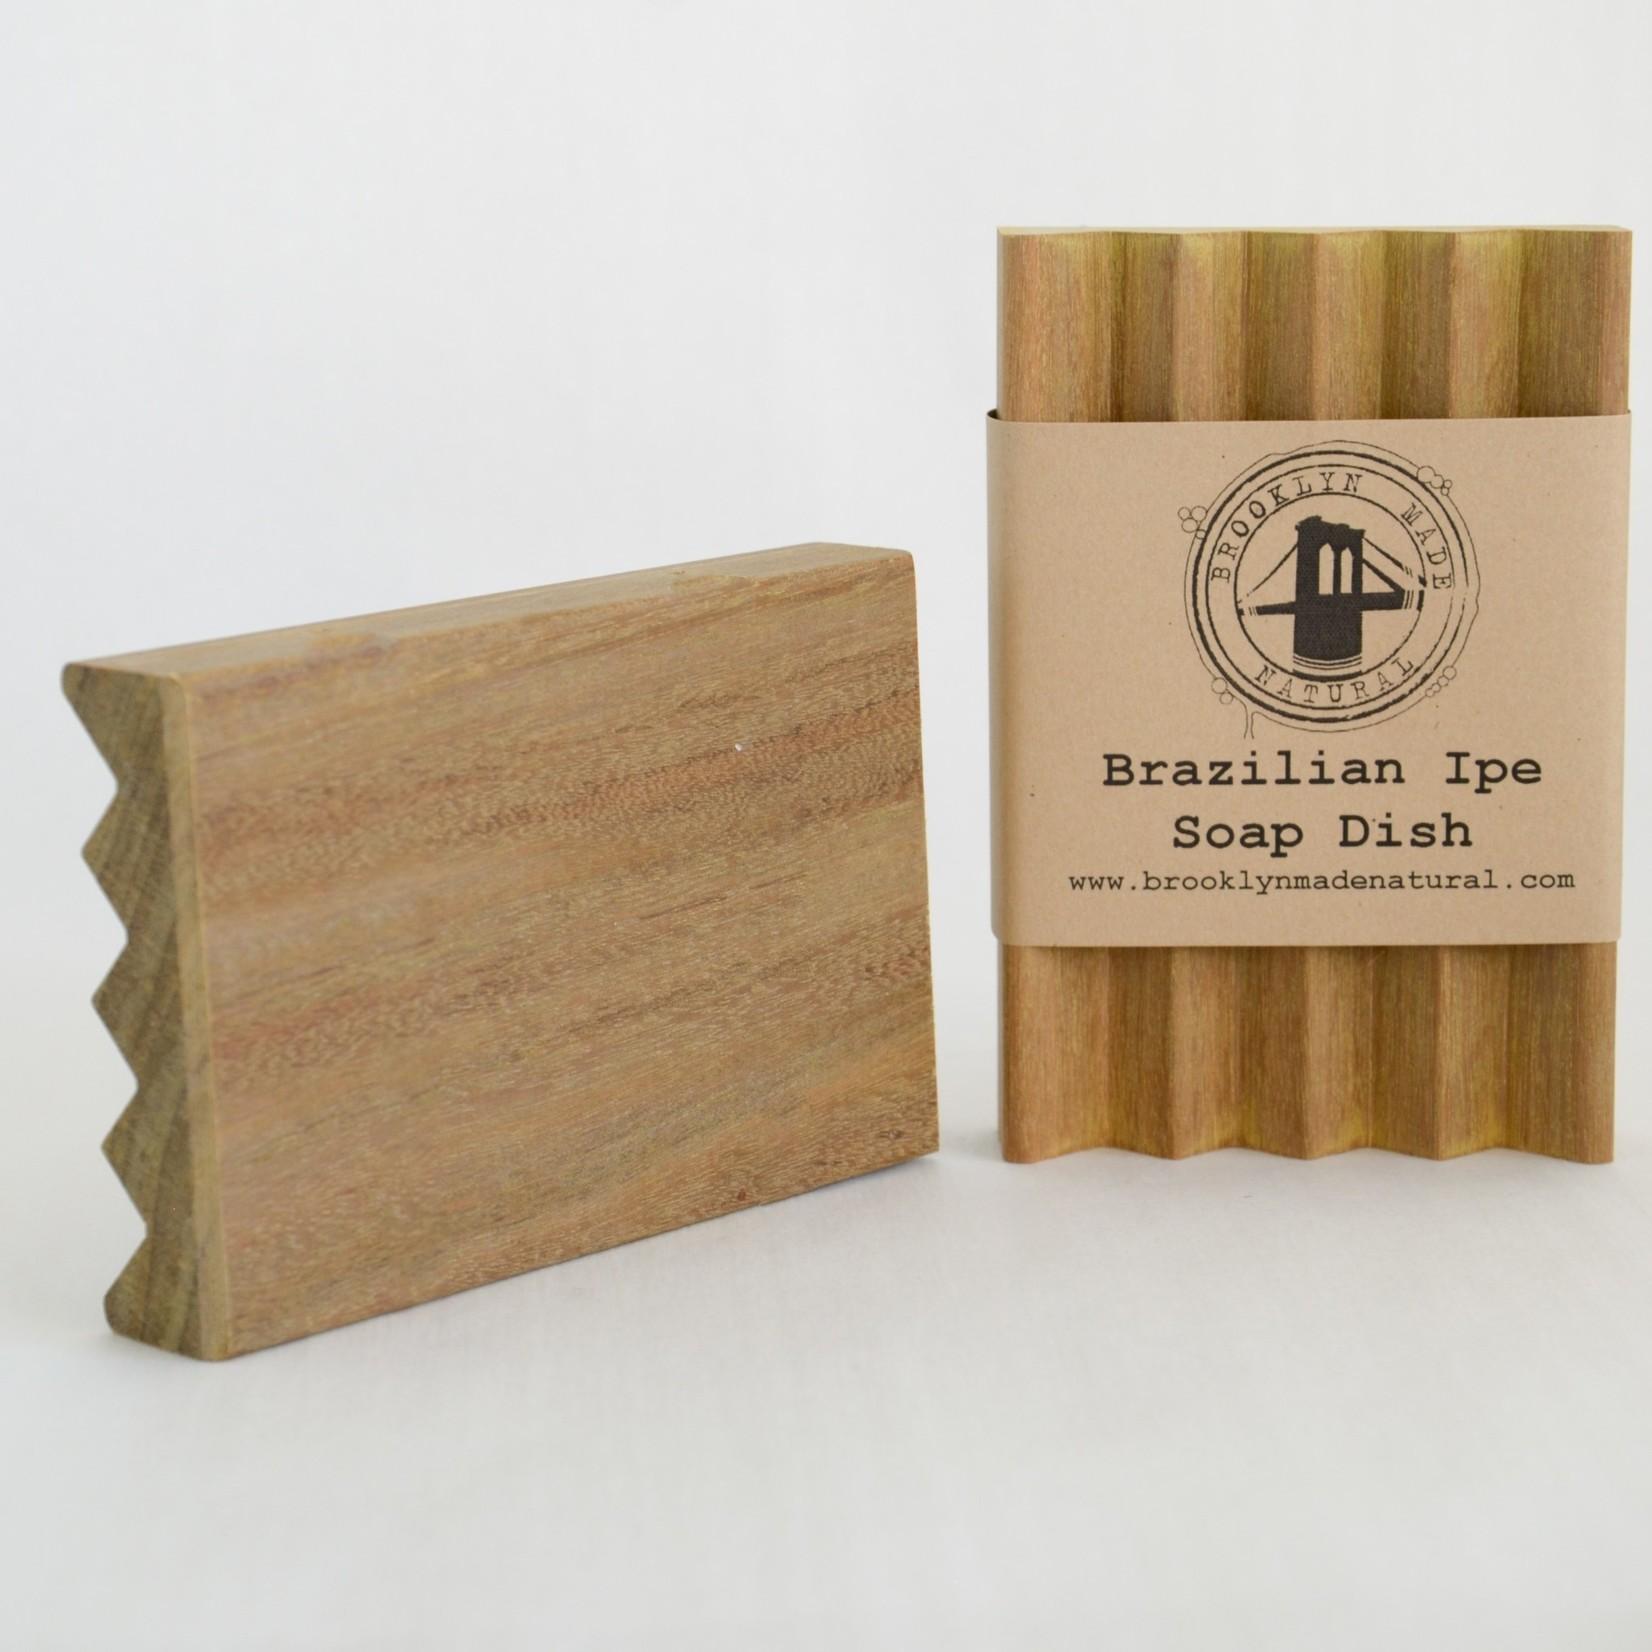 Brooklyn Made Natural Brooklyn Made Natural Brazilian Ipe Soap Dish